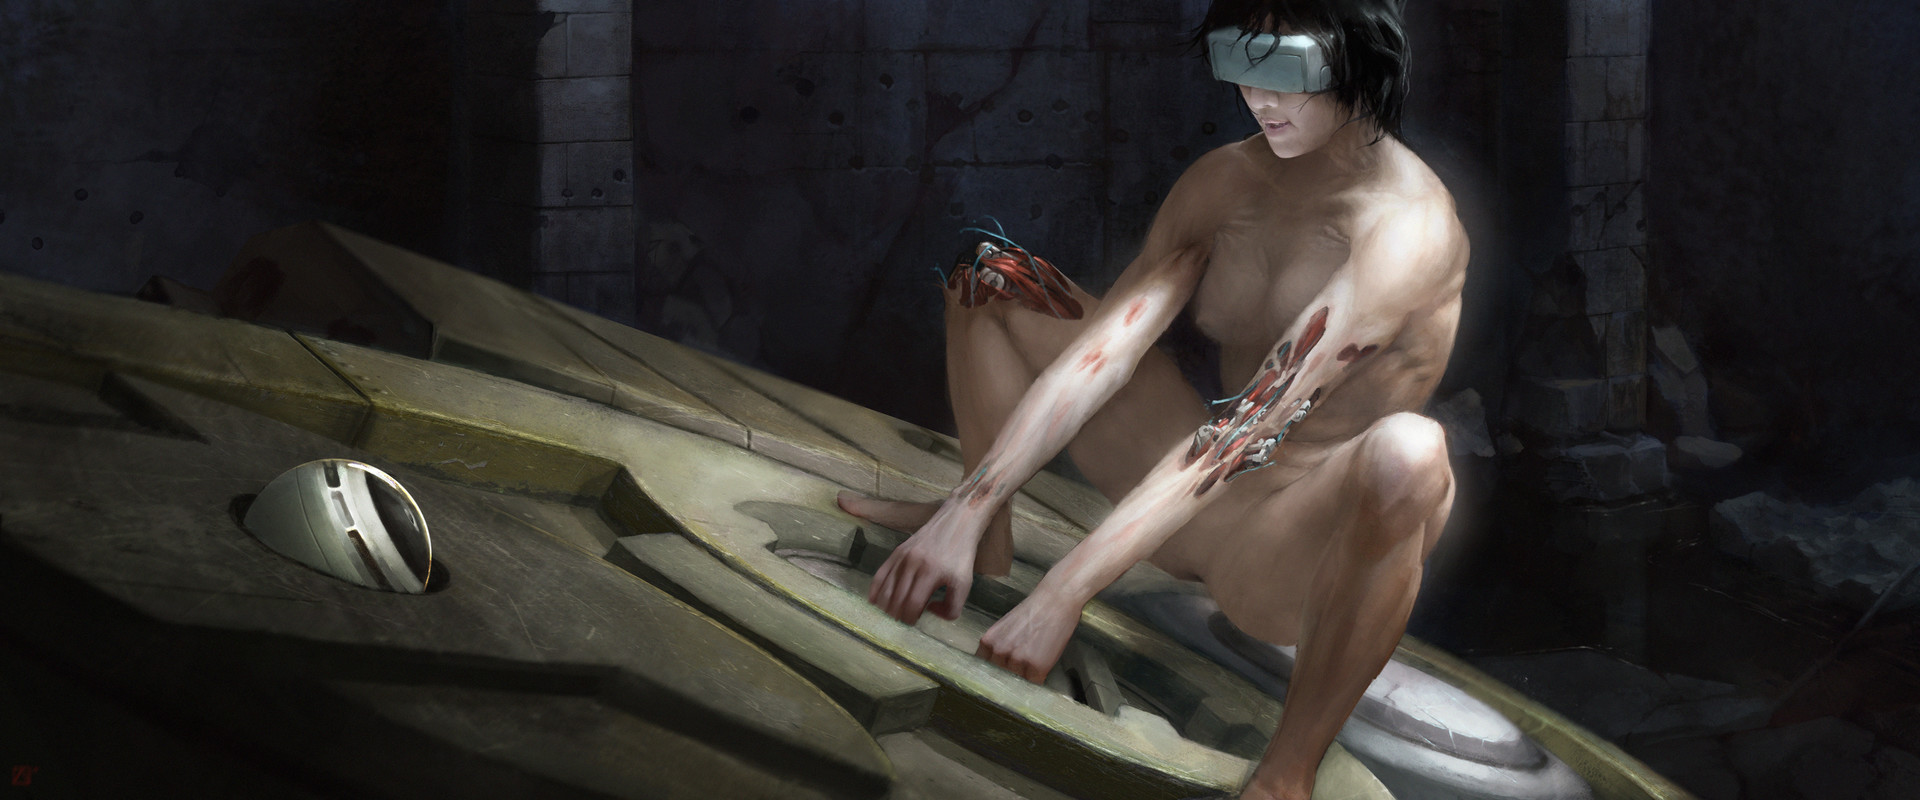 Movie clip ghost nude